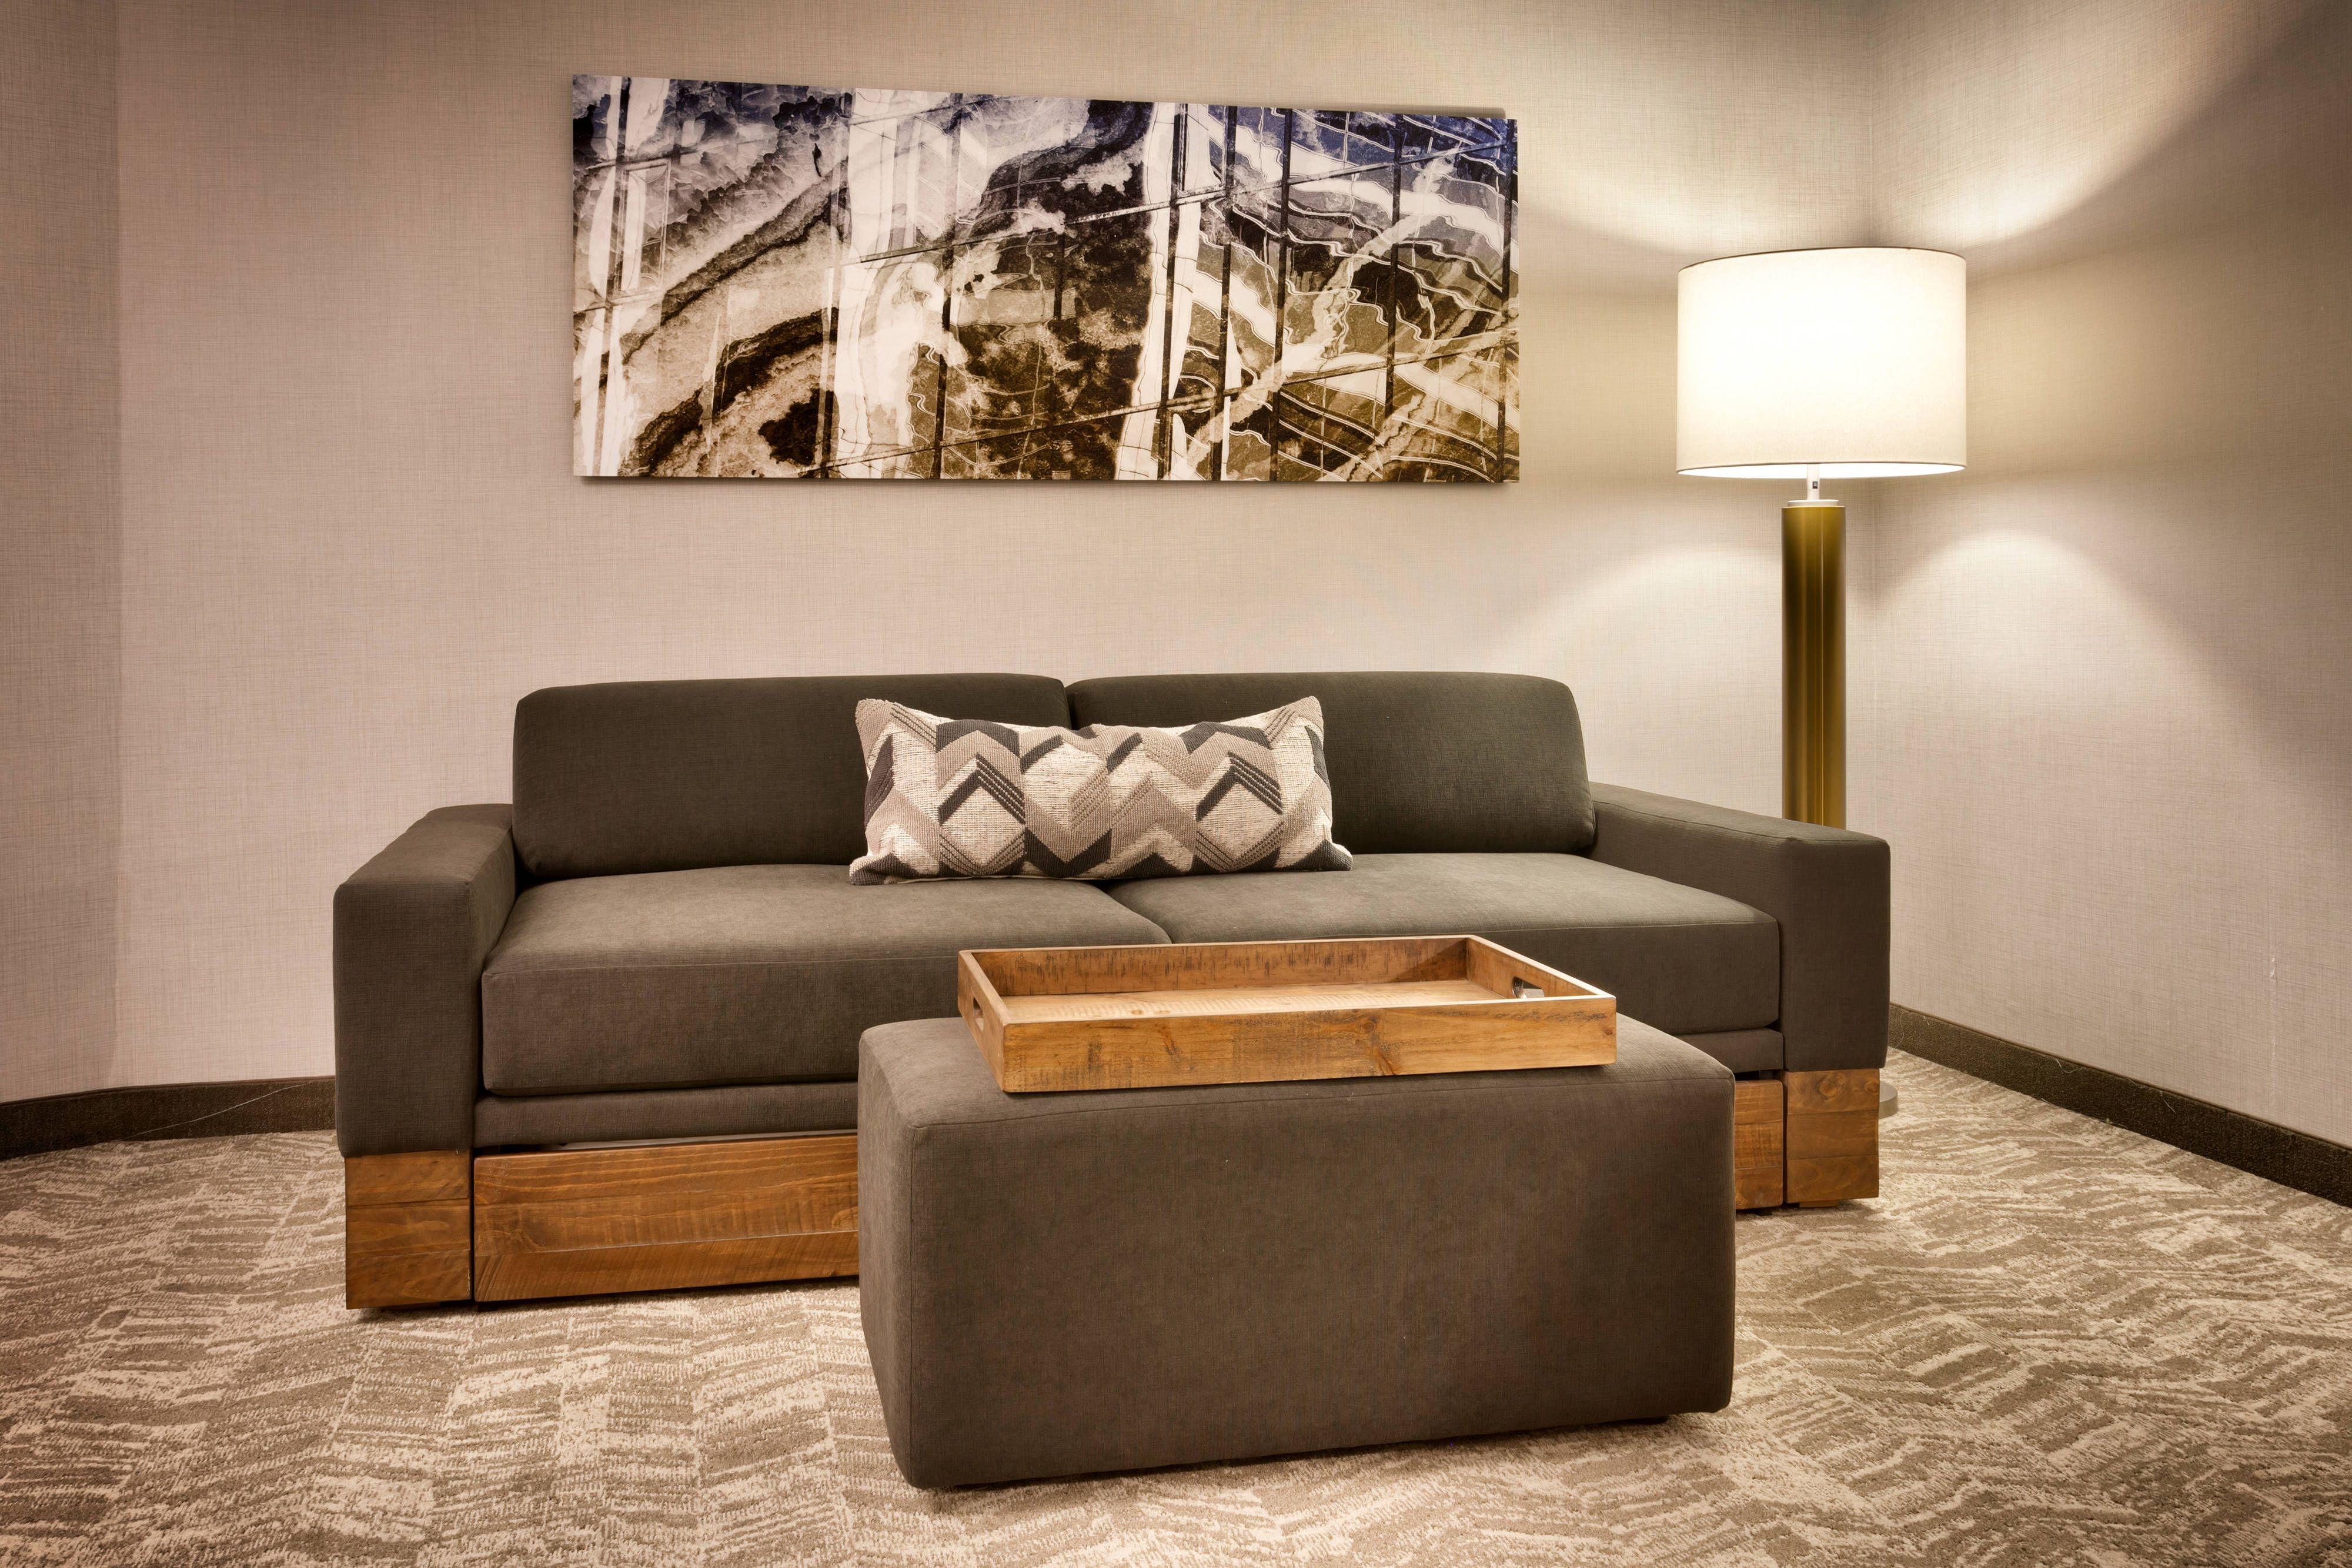 Springhill Suites Coralville West Elm Sofa Bed Enjoying Hotels Memorable West Elm Sofa Suites Springhill